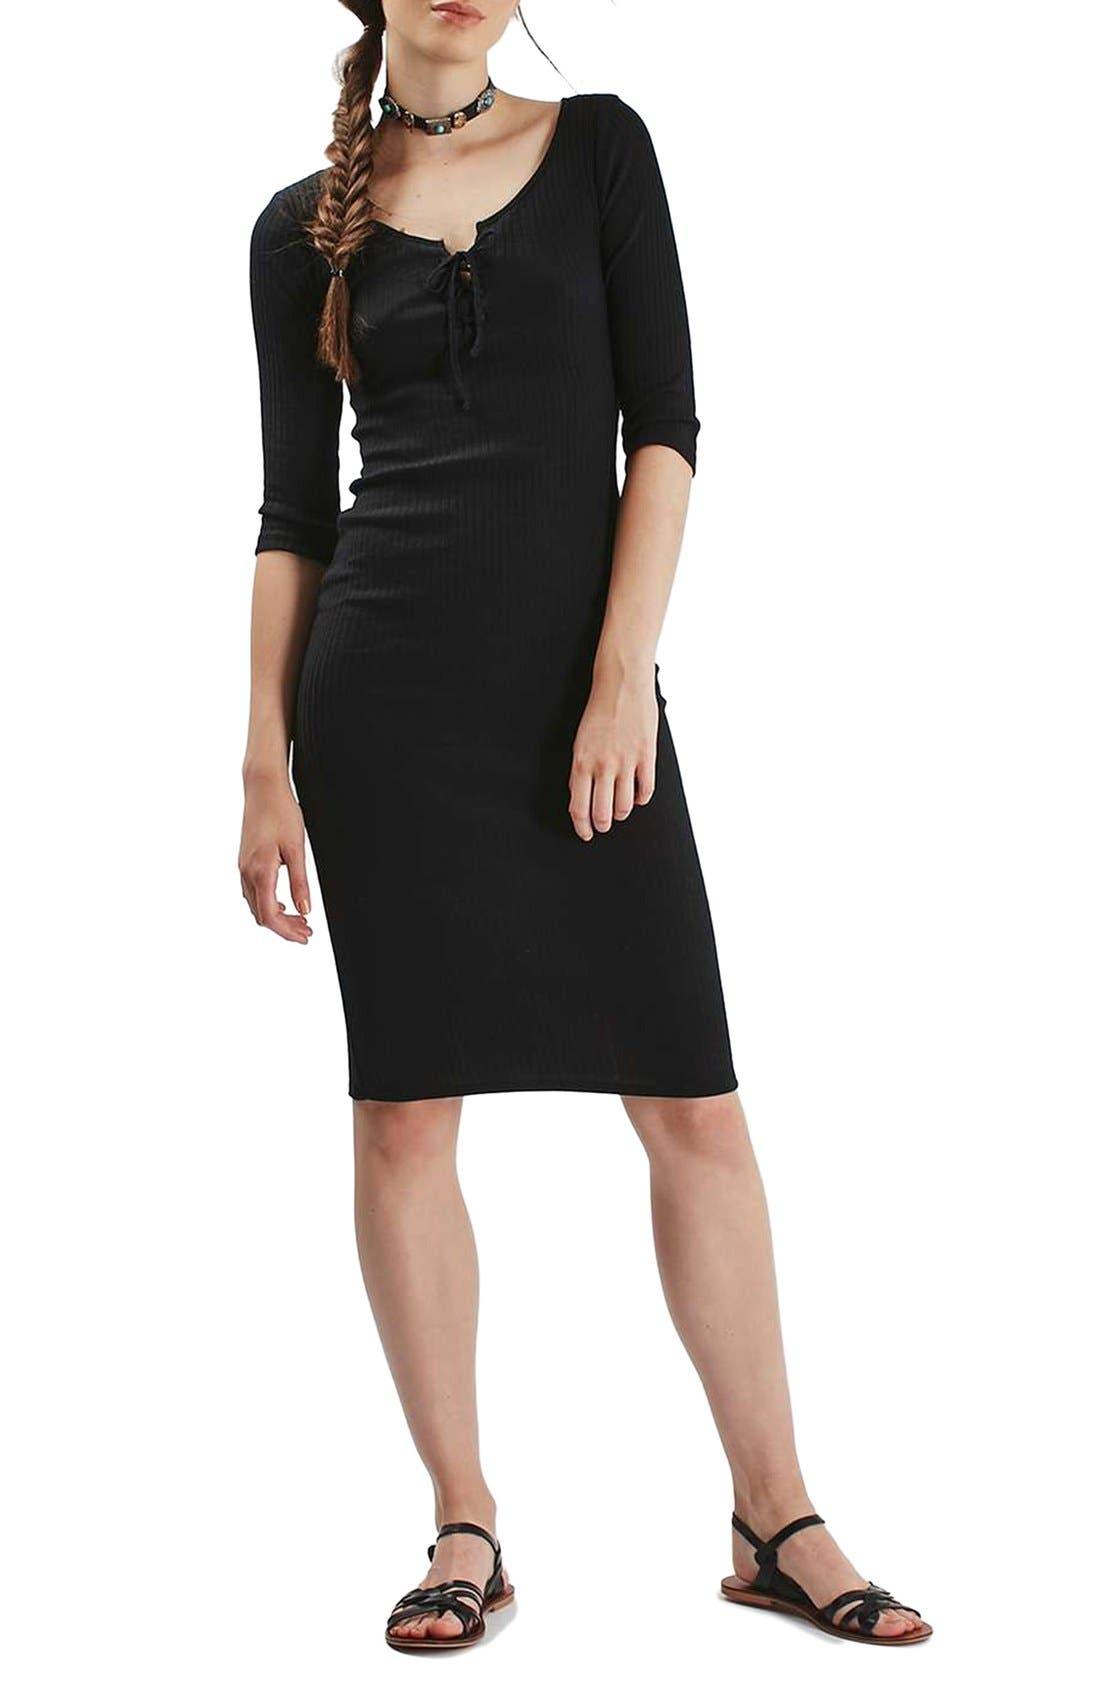 Main Image - Topshop Lace-Up Ribbed Body-Con Midi Dress